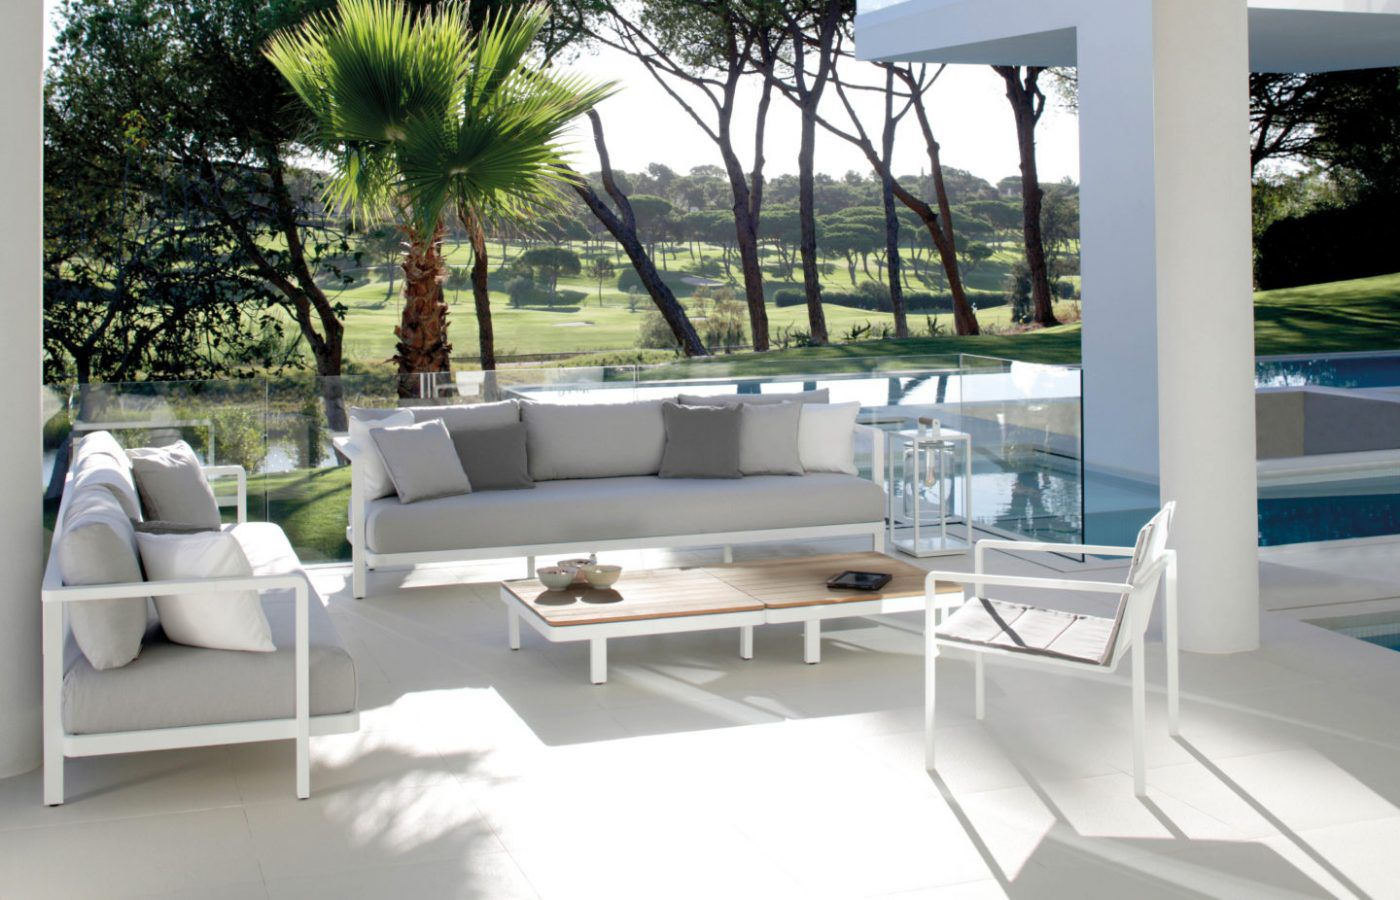 RM Living Cincinnati Custom Contemporary Outdoor Furniture By Royal Botania